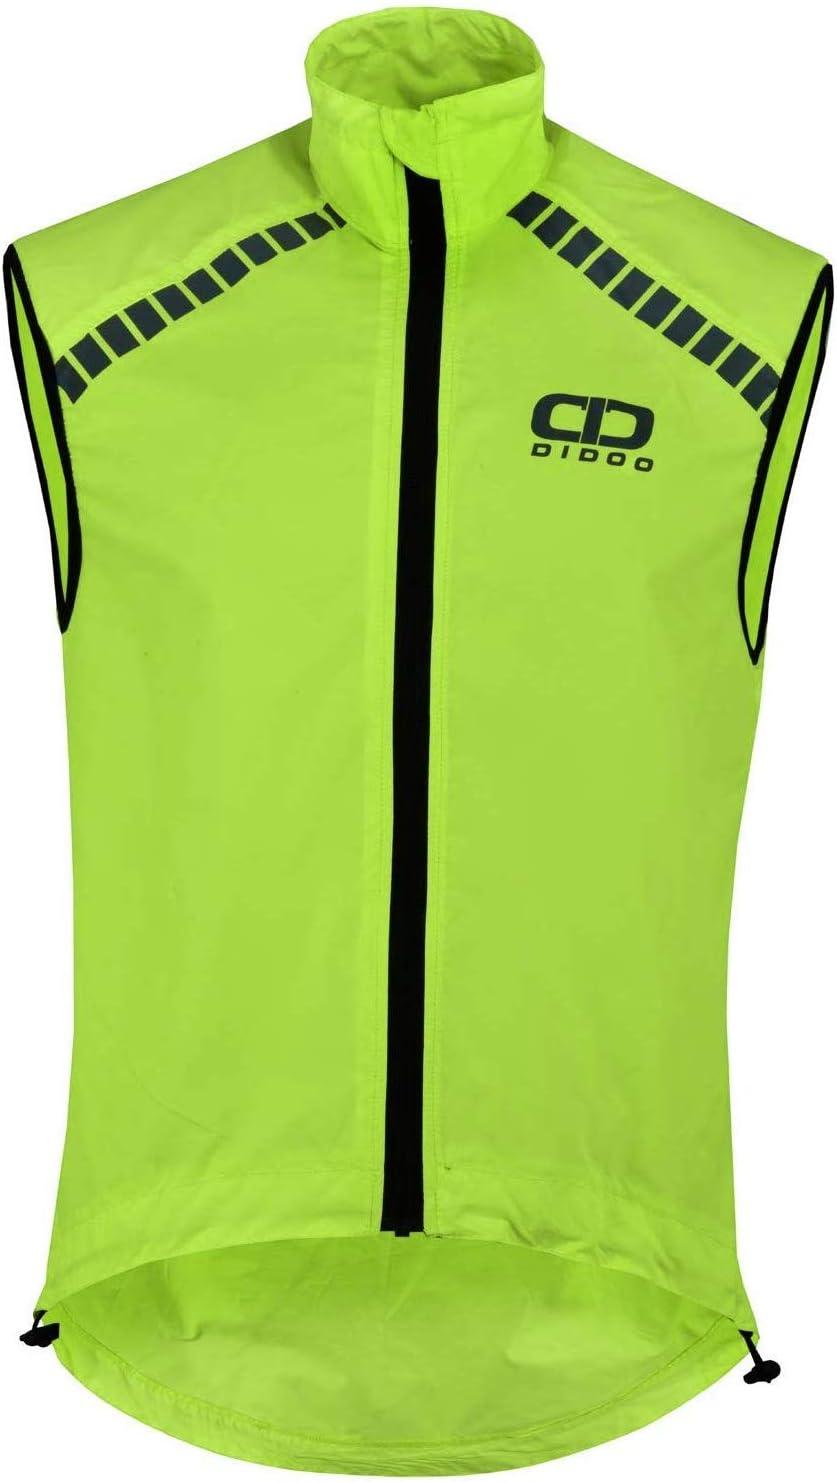 Didoo Cycling Gilet Men Reflective Vest Bicycle Top for MTB Hi-Viz Windproof Safety Running Cycling Biking Sleeveless Jacket